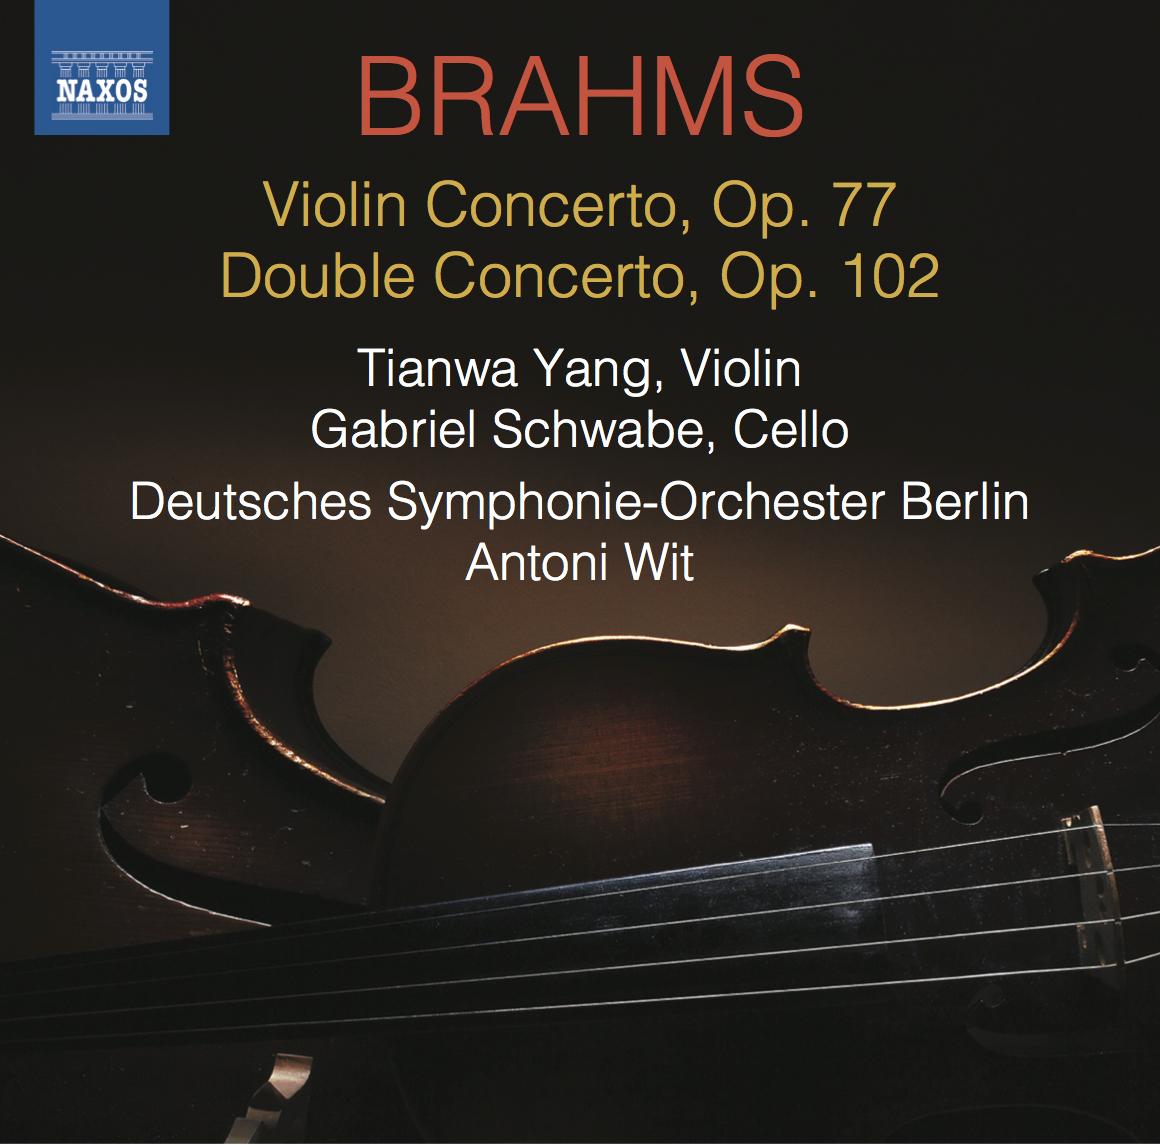 Johannes Brahms  Violin Concerto | Double Concerto  Tianwa Yang, violin Gabriel Schwabe, violoncello  Deutsches Symphonie-Orchester Berlin Antoni Wit, conductor   More Info